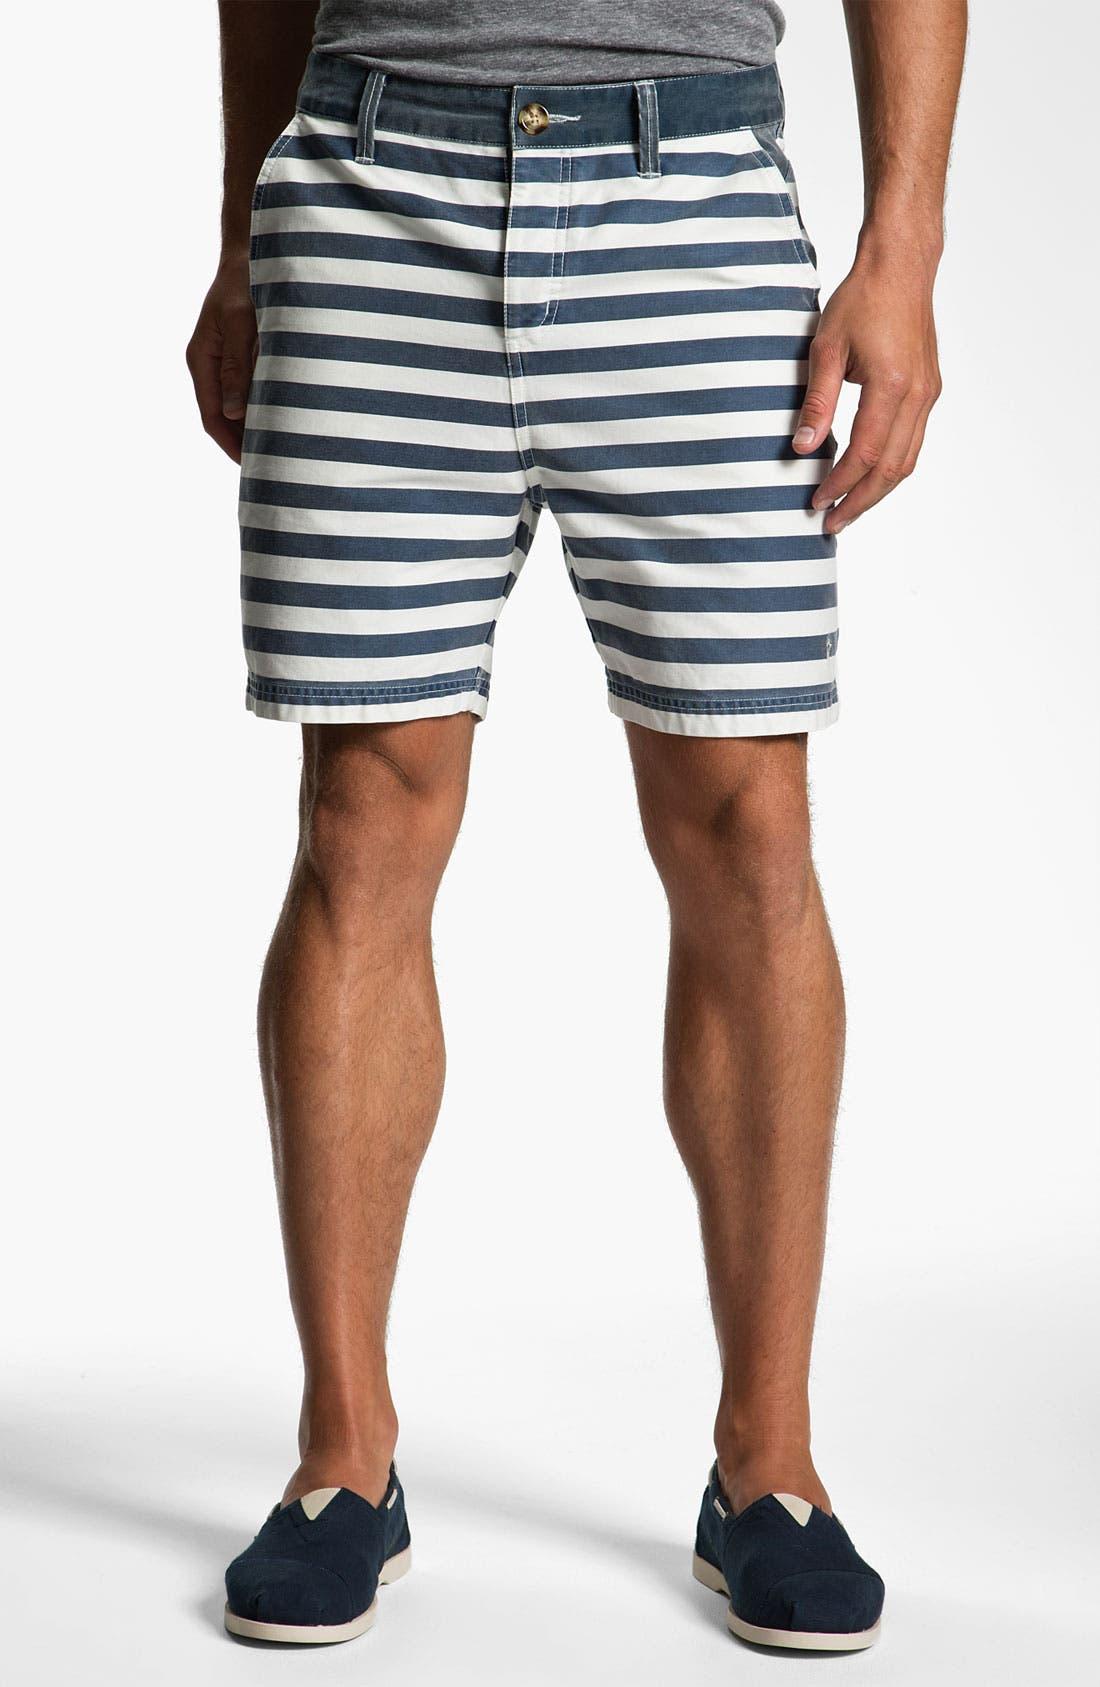 Alternate Image 1 Selected - Zanerobe 'Mallorca' Shorts